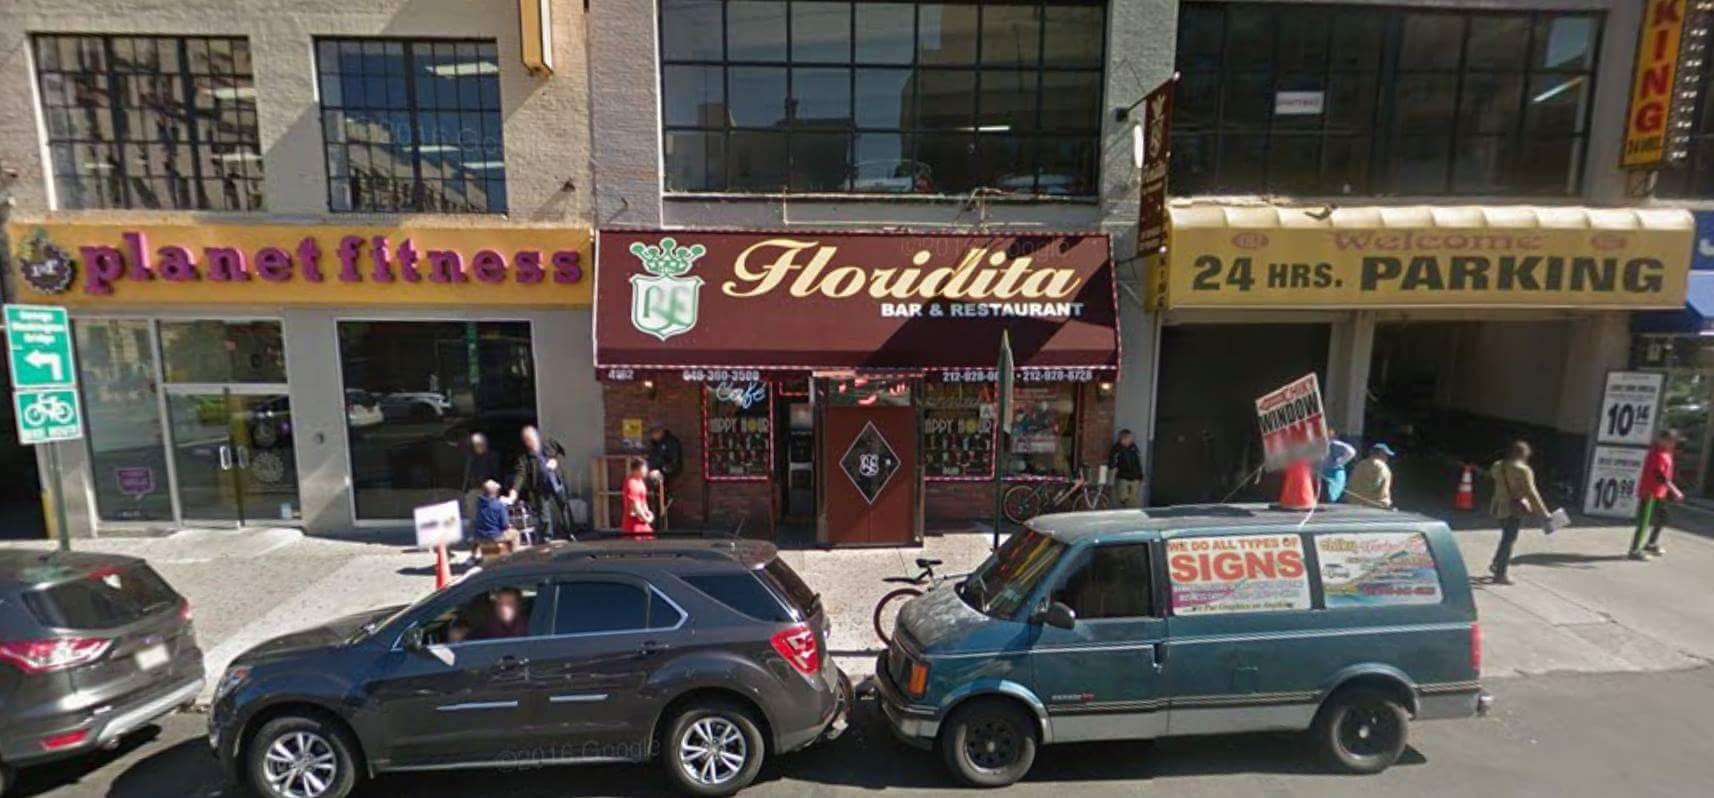 Floridita restaurant uptown fitness workout